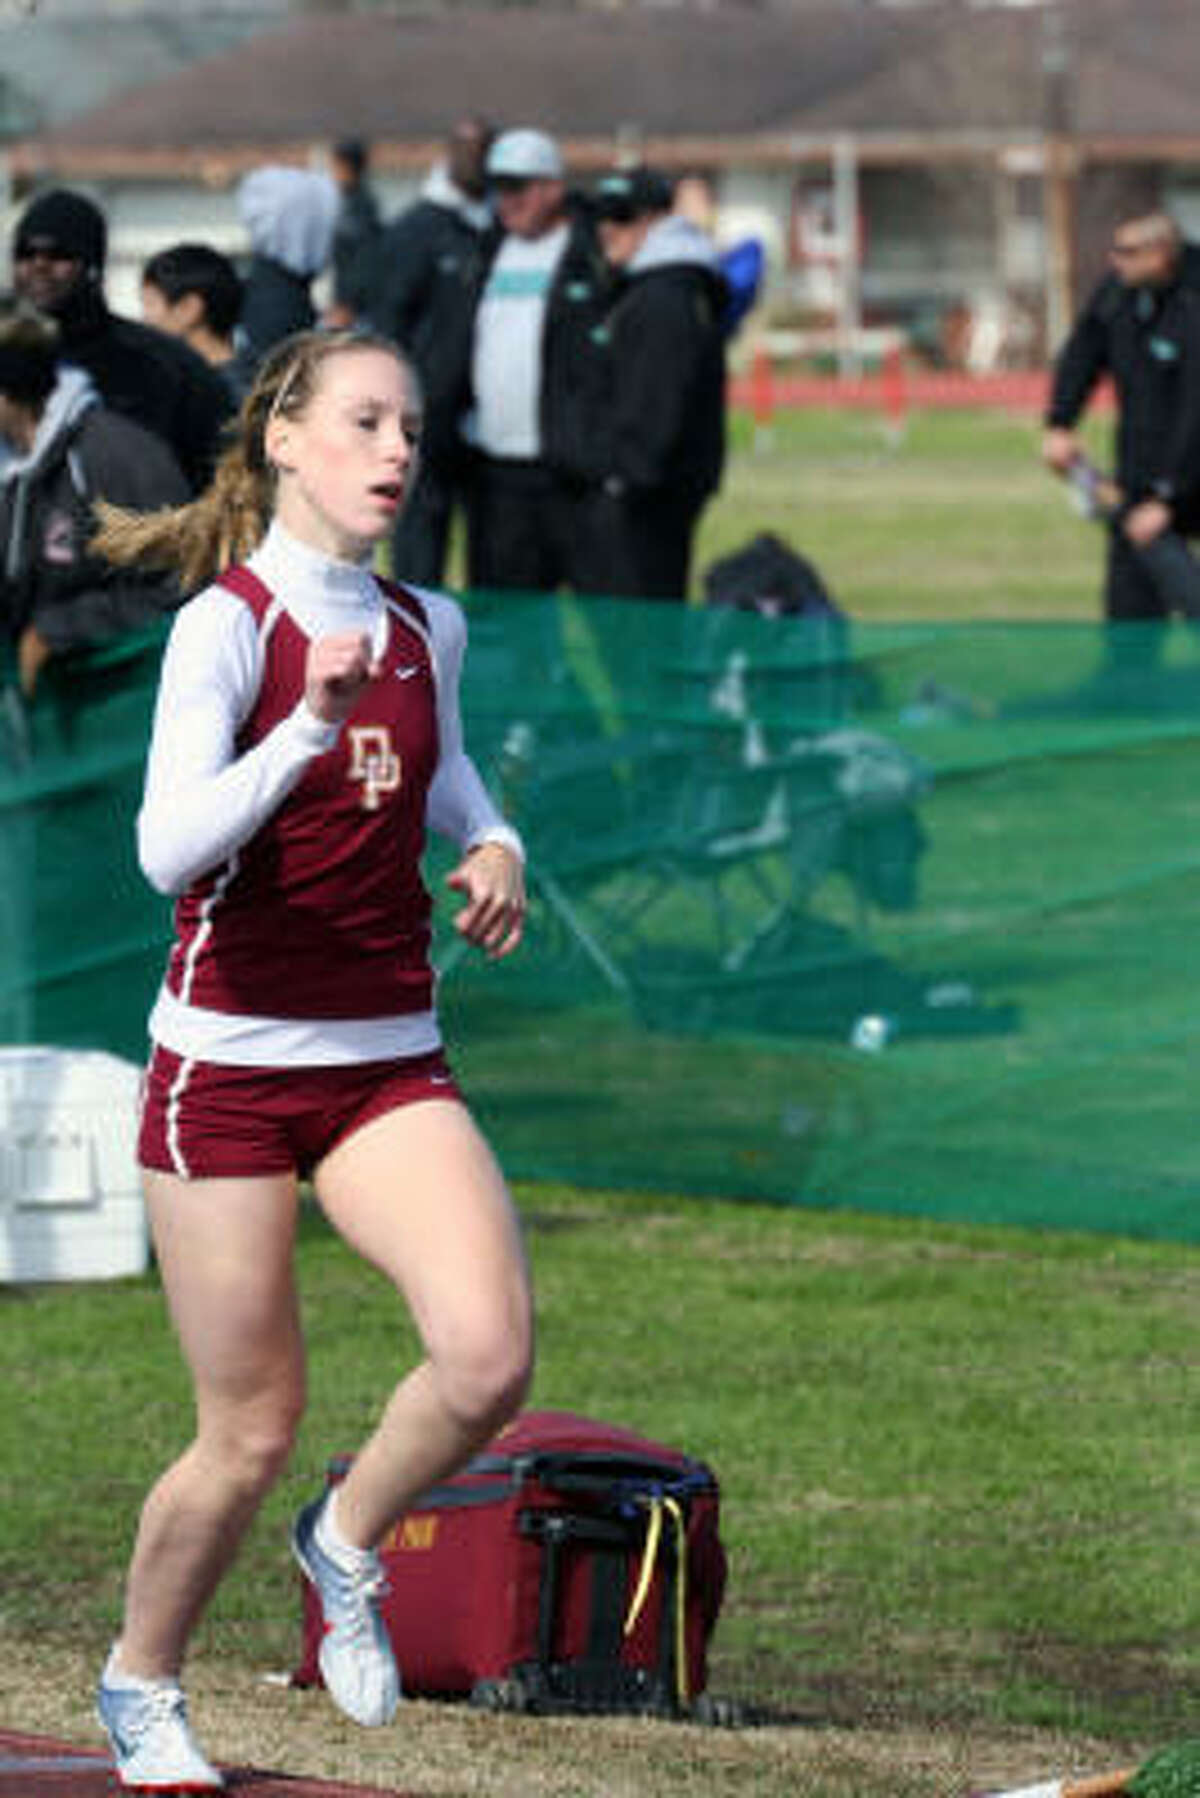 Jessica Whitt of Deer Park taking the 800-meter run in 2:20.57 seconds.